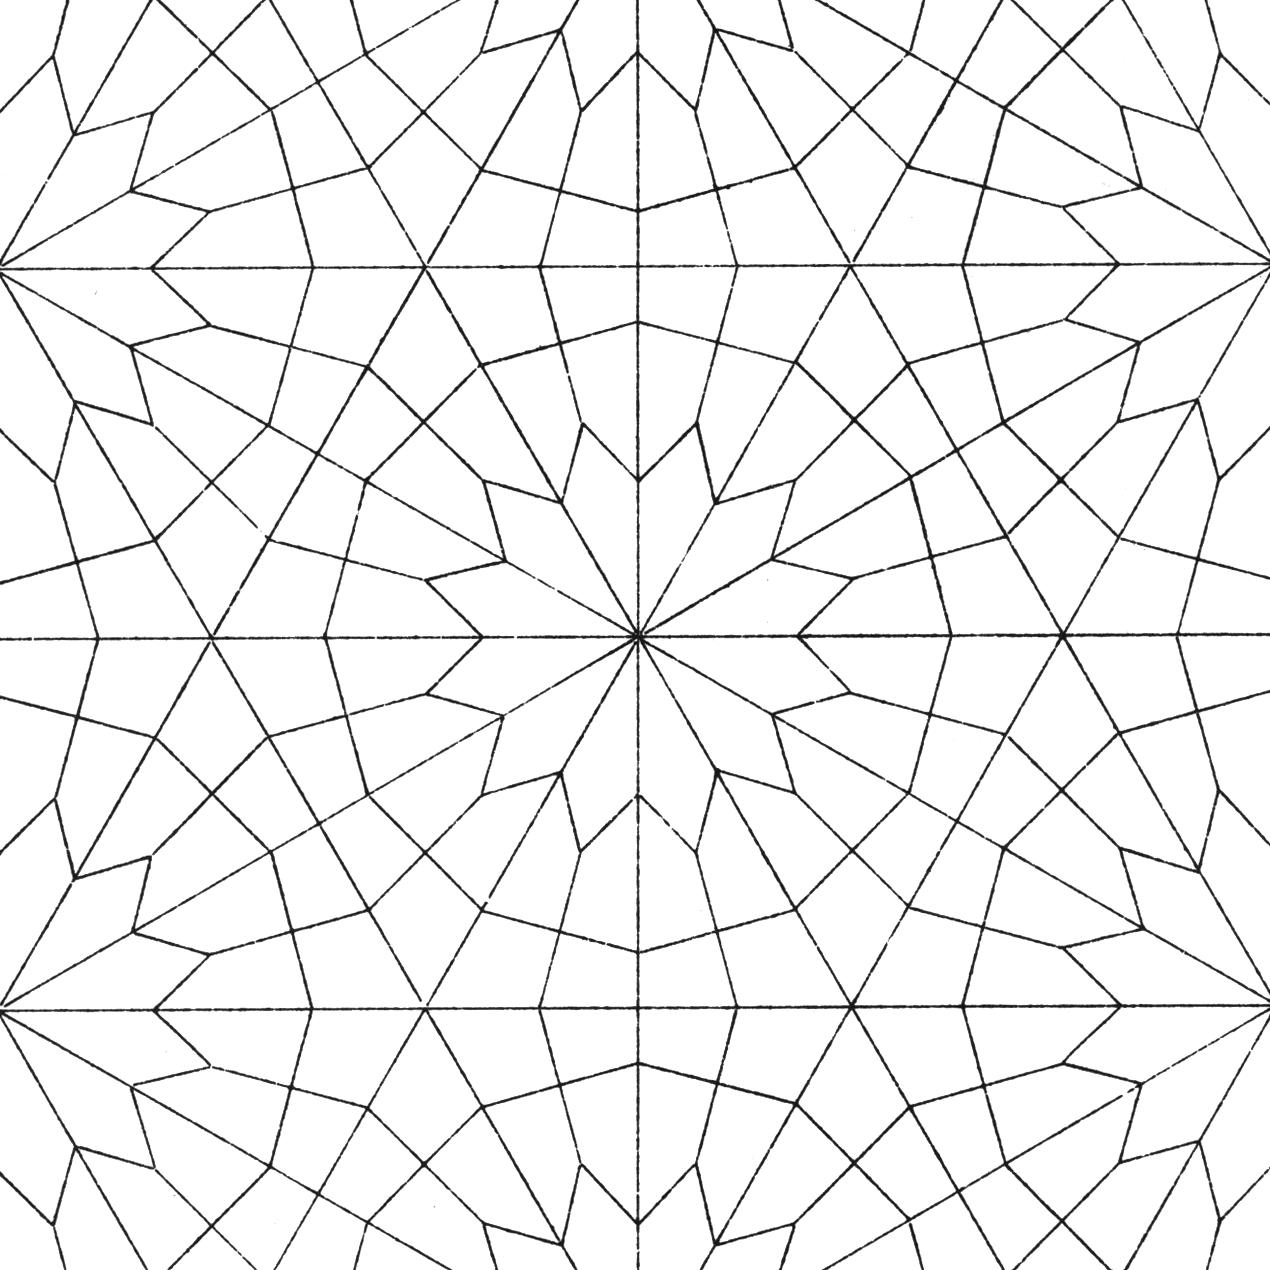 The David Collection Islamic Patterns Pattern Coloring Pages Geometric Patterns Coloring Islamic Patterns